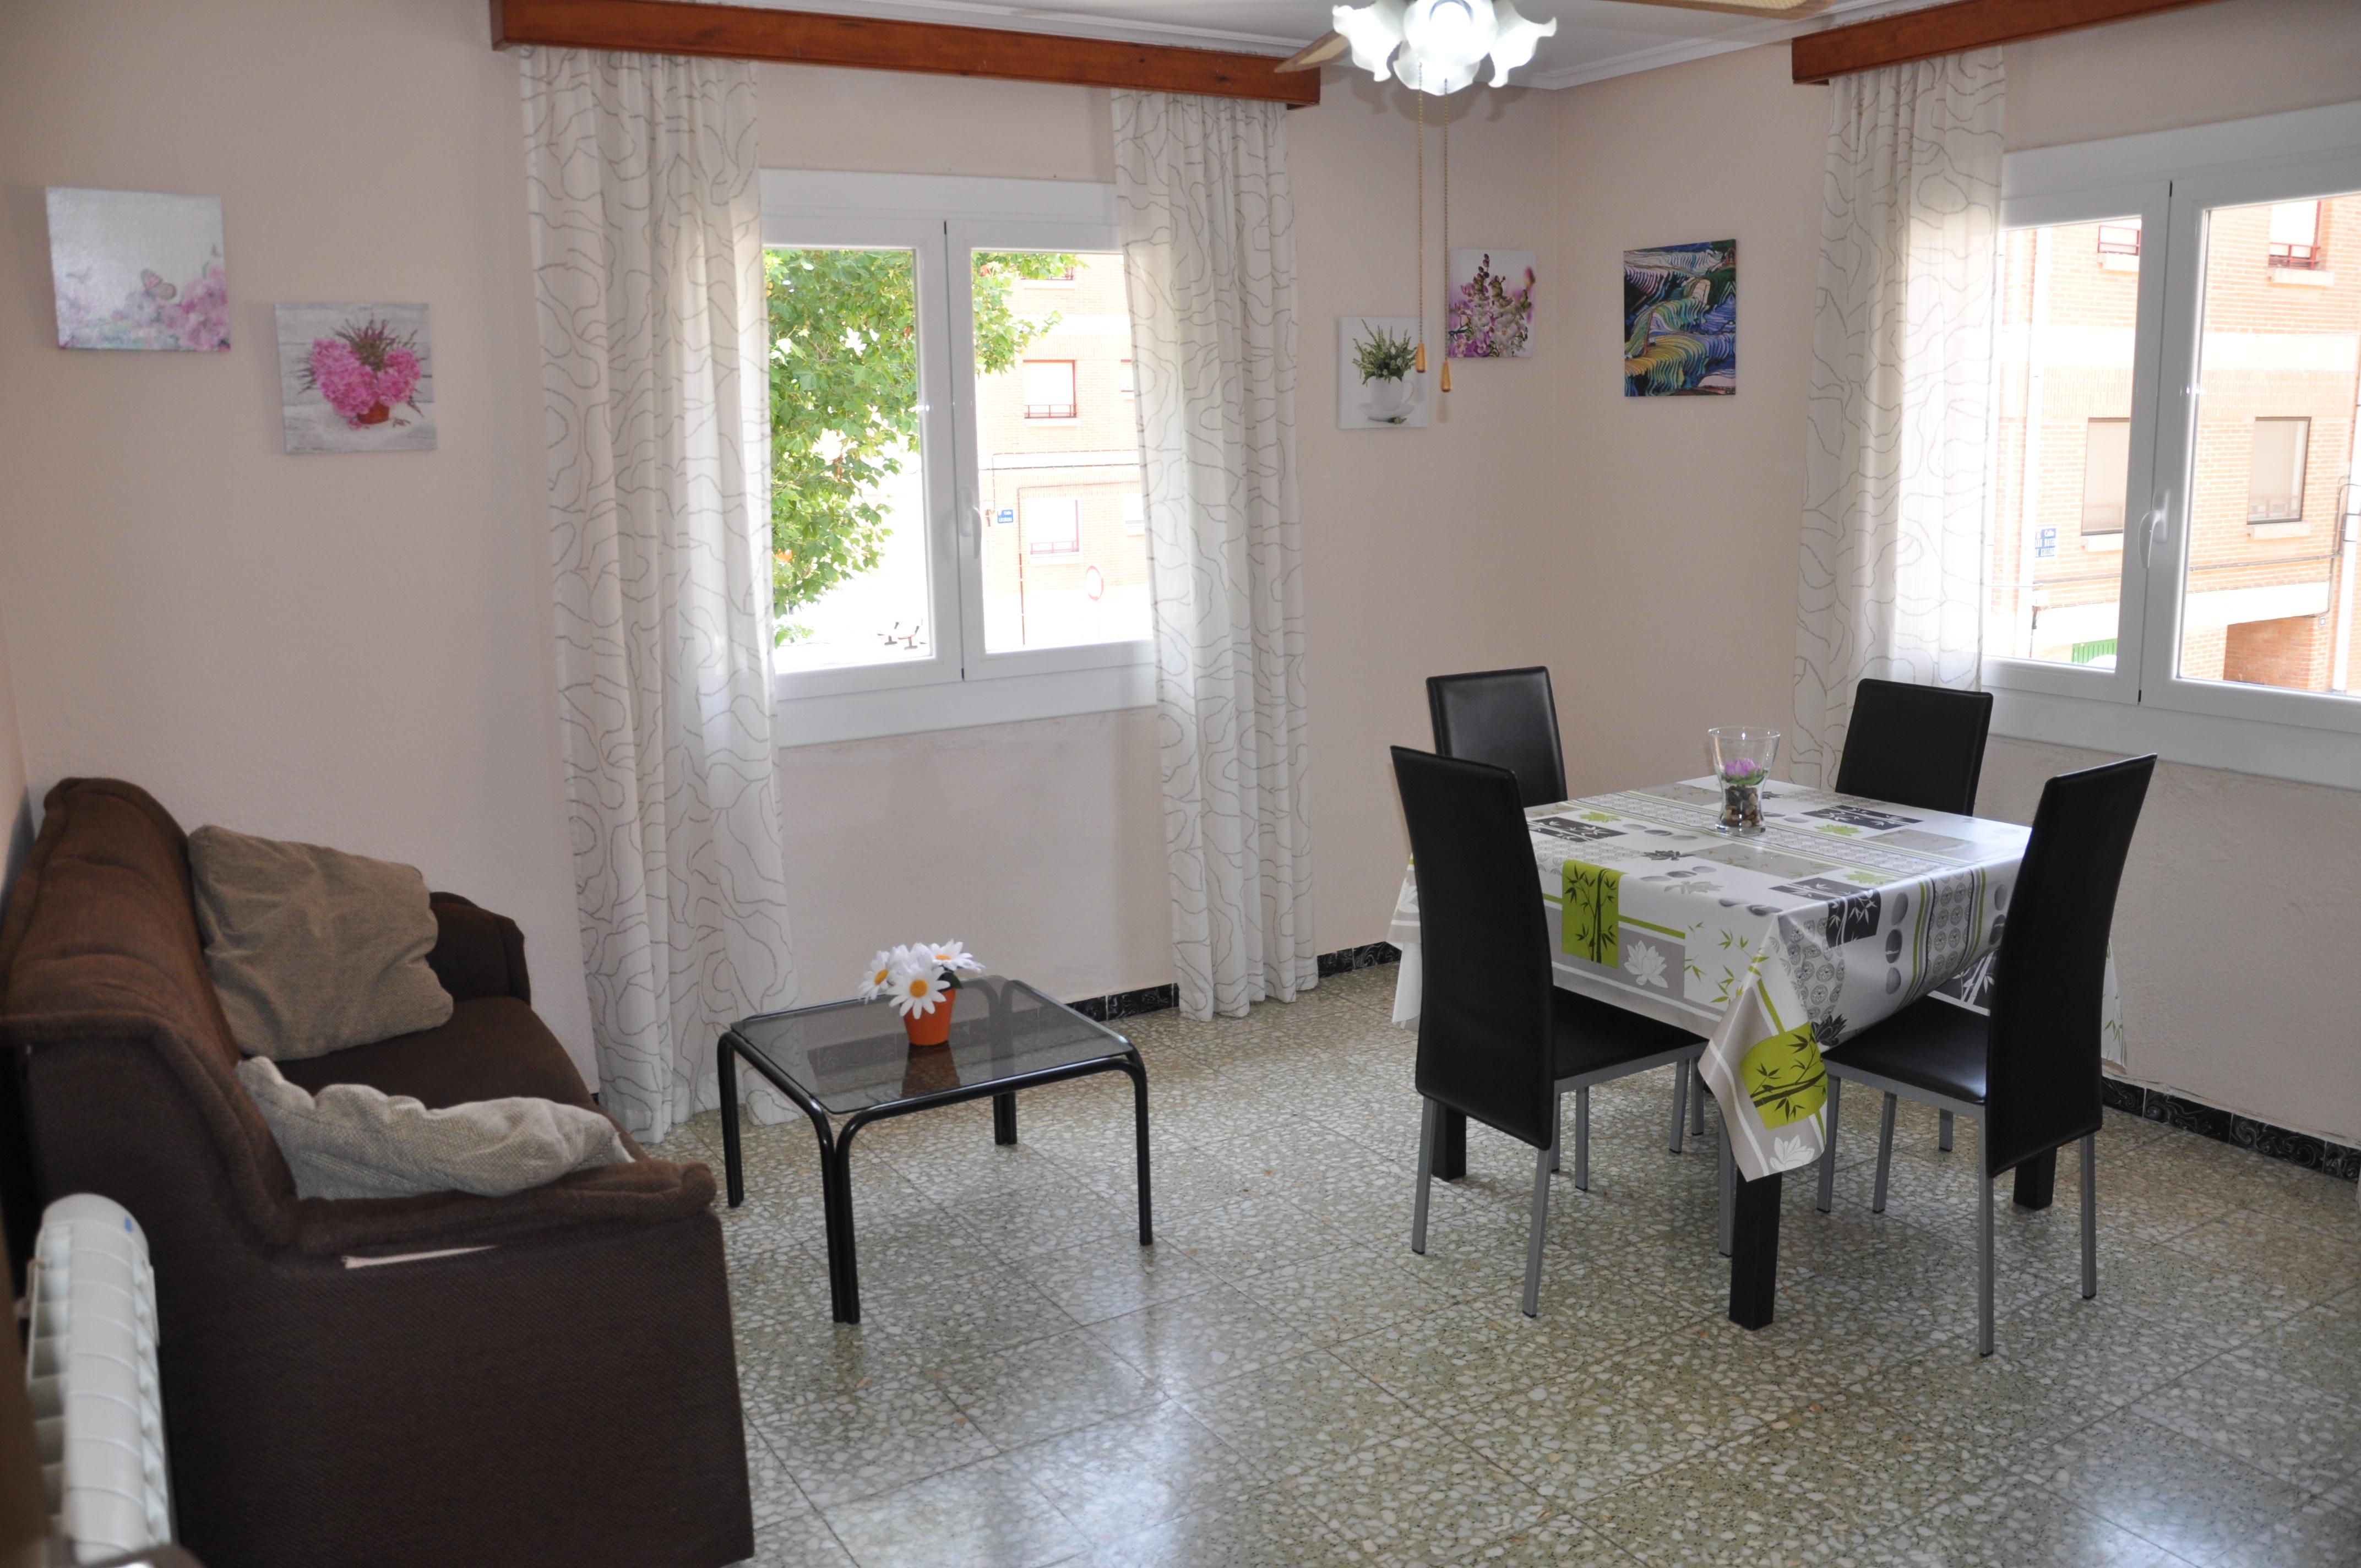 appartement-maison-2 chambres-villanueva de gallego-villanueva de gállego-60m2